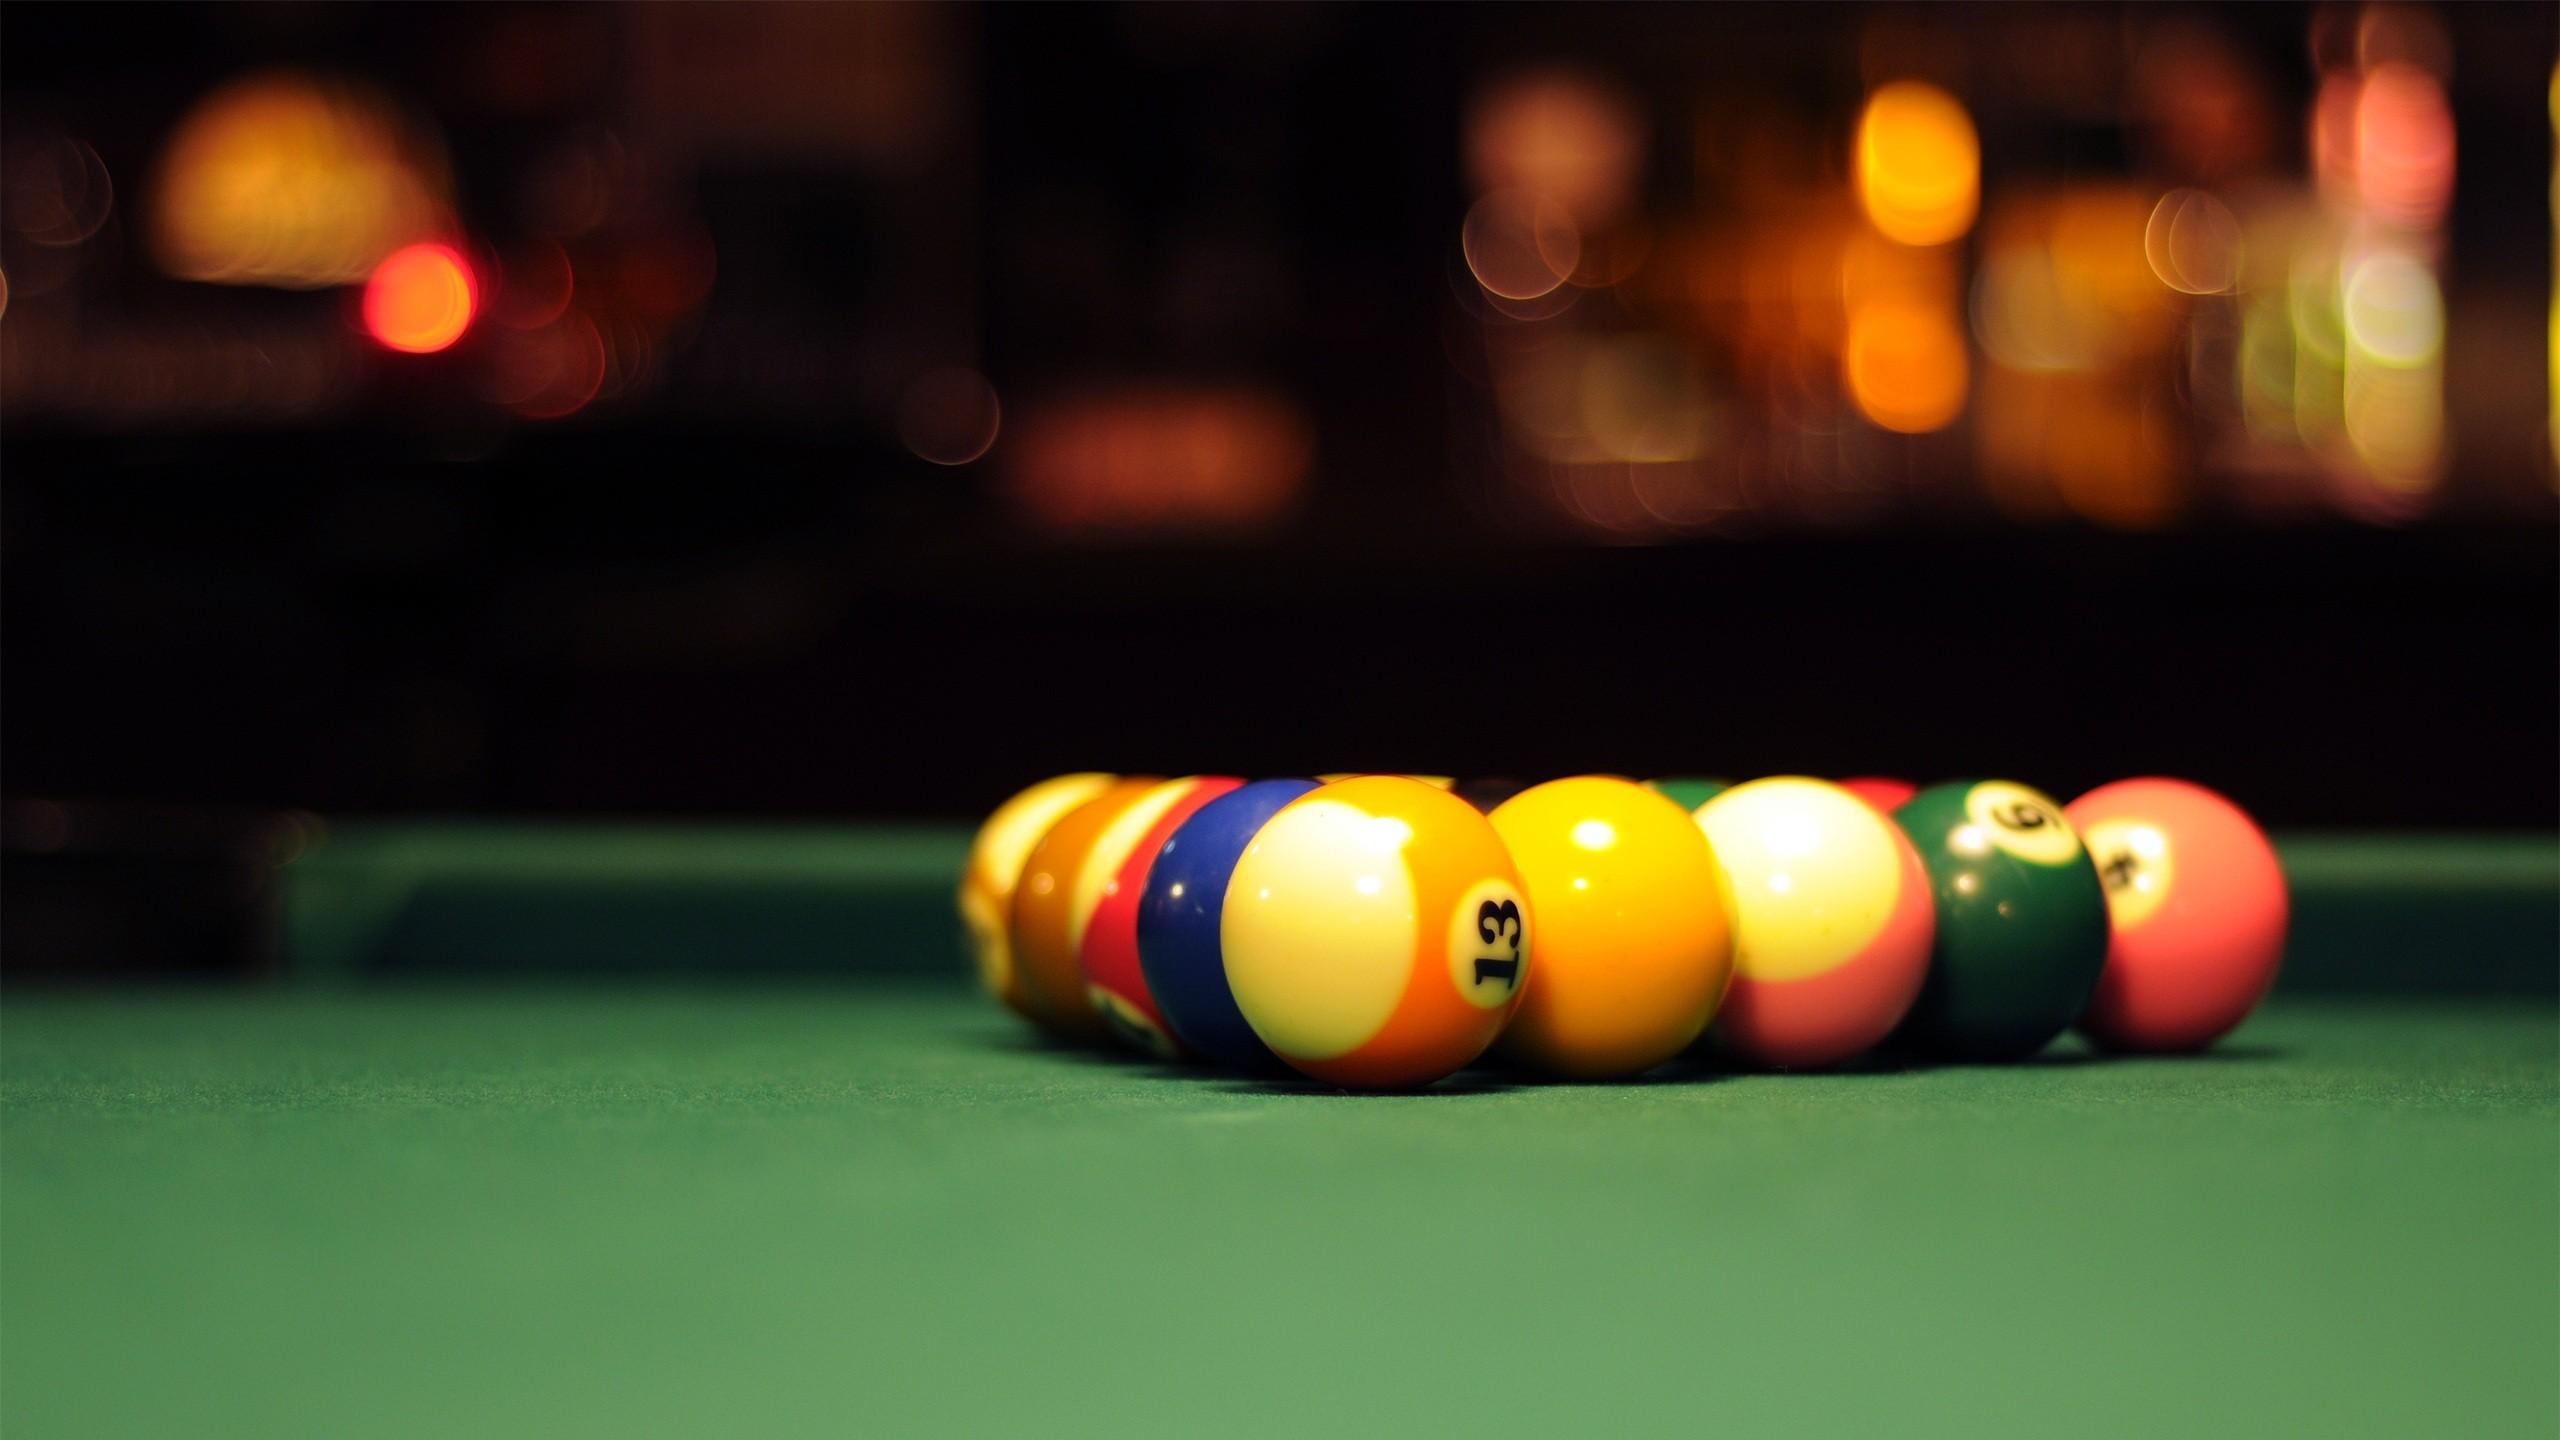 Wallpaper : depth of field, bokeh, billiard balls, Snooker